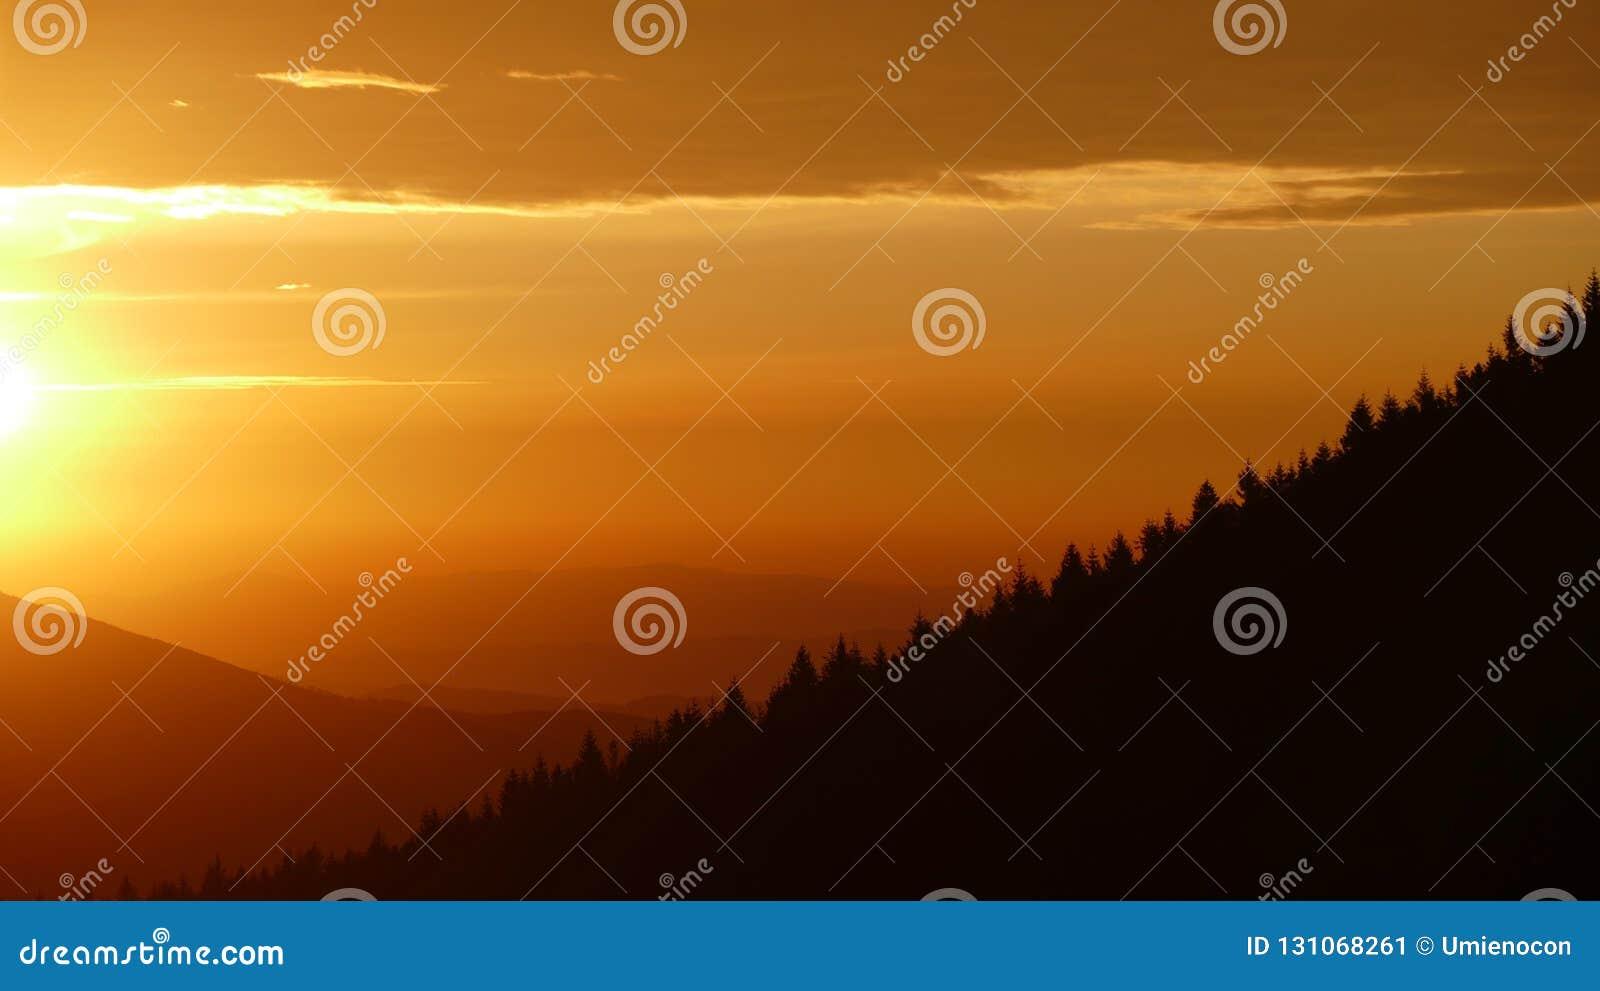 Orange sunrise. Before it finally arises, it shines briefly in orange.